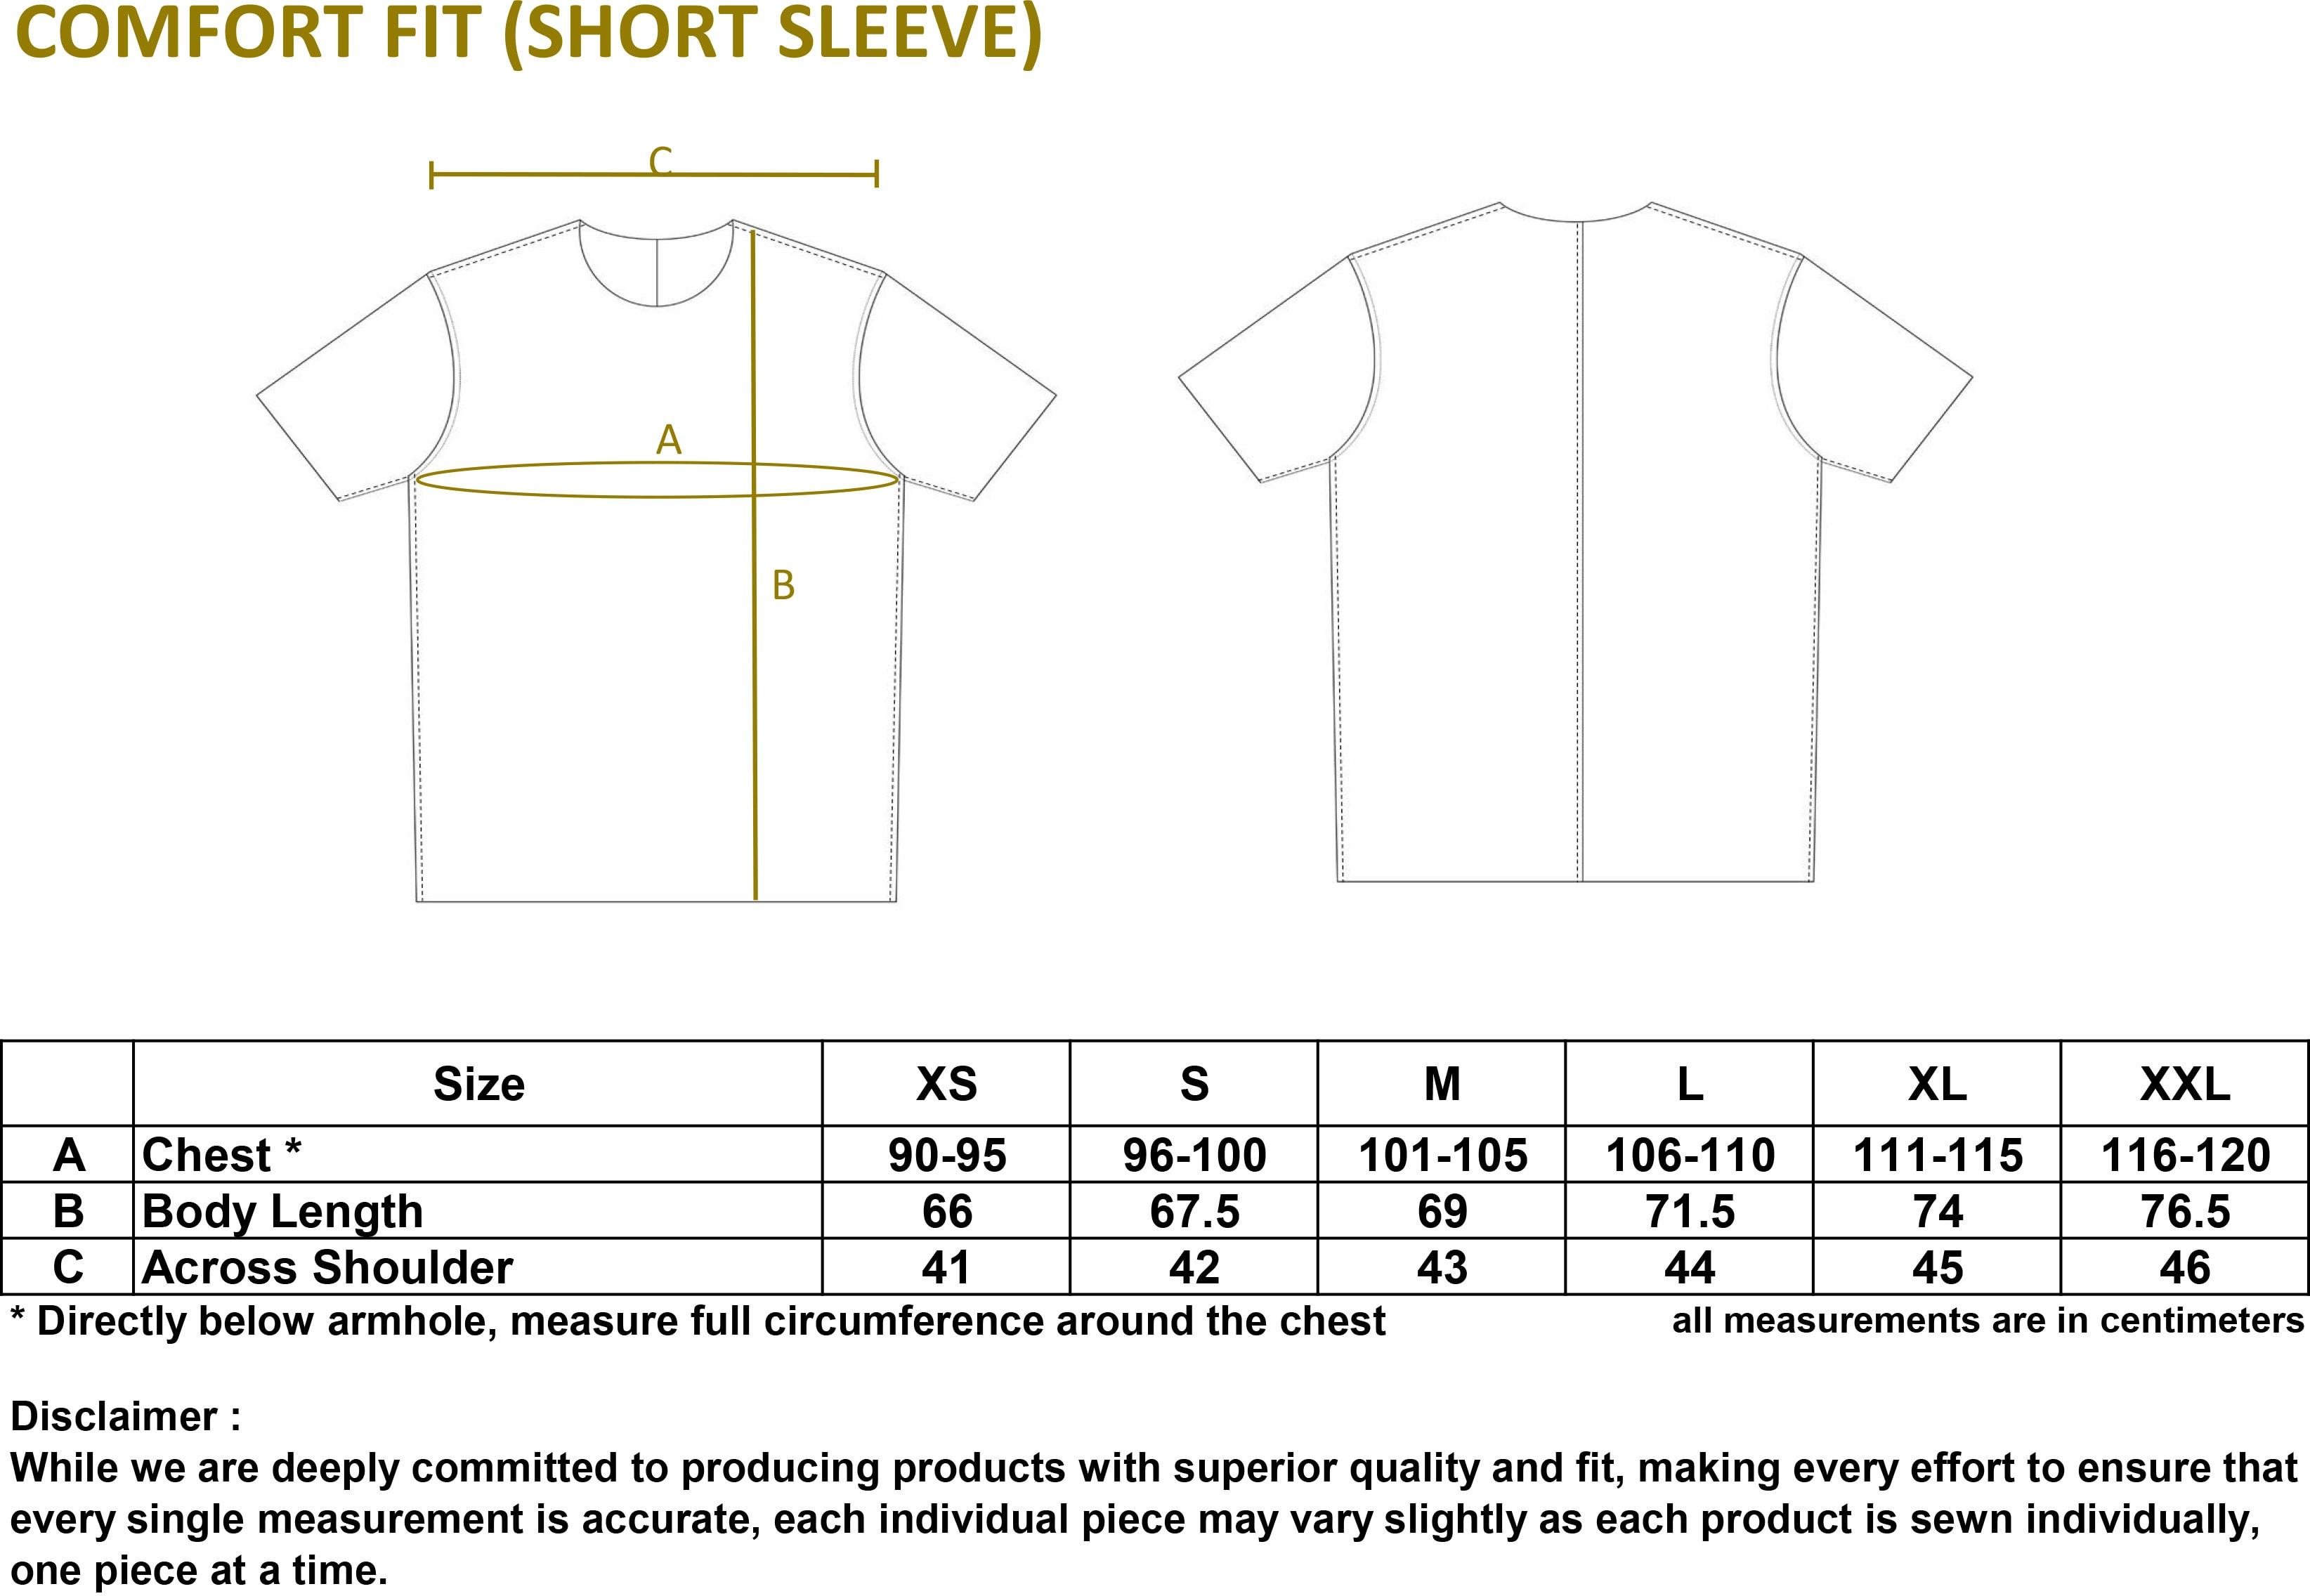 Cotton Spandex T-shirt Size Guide (Comfort Fit - Short Sleeve)